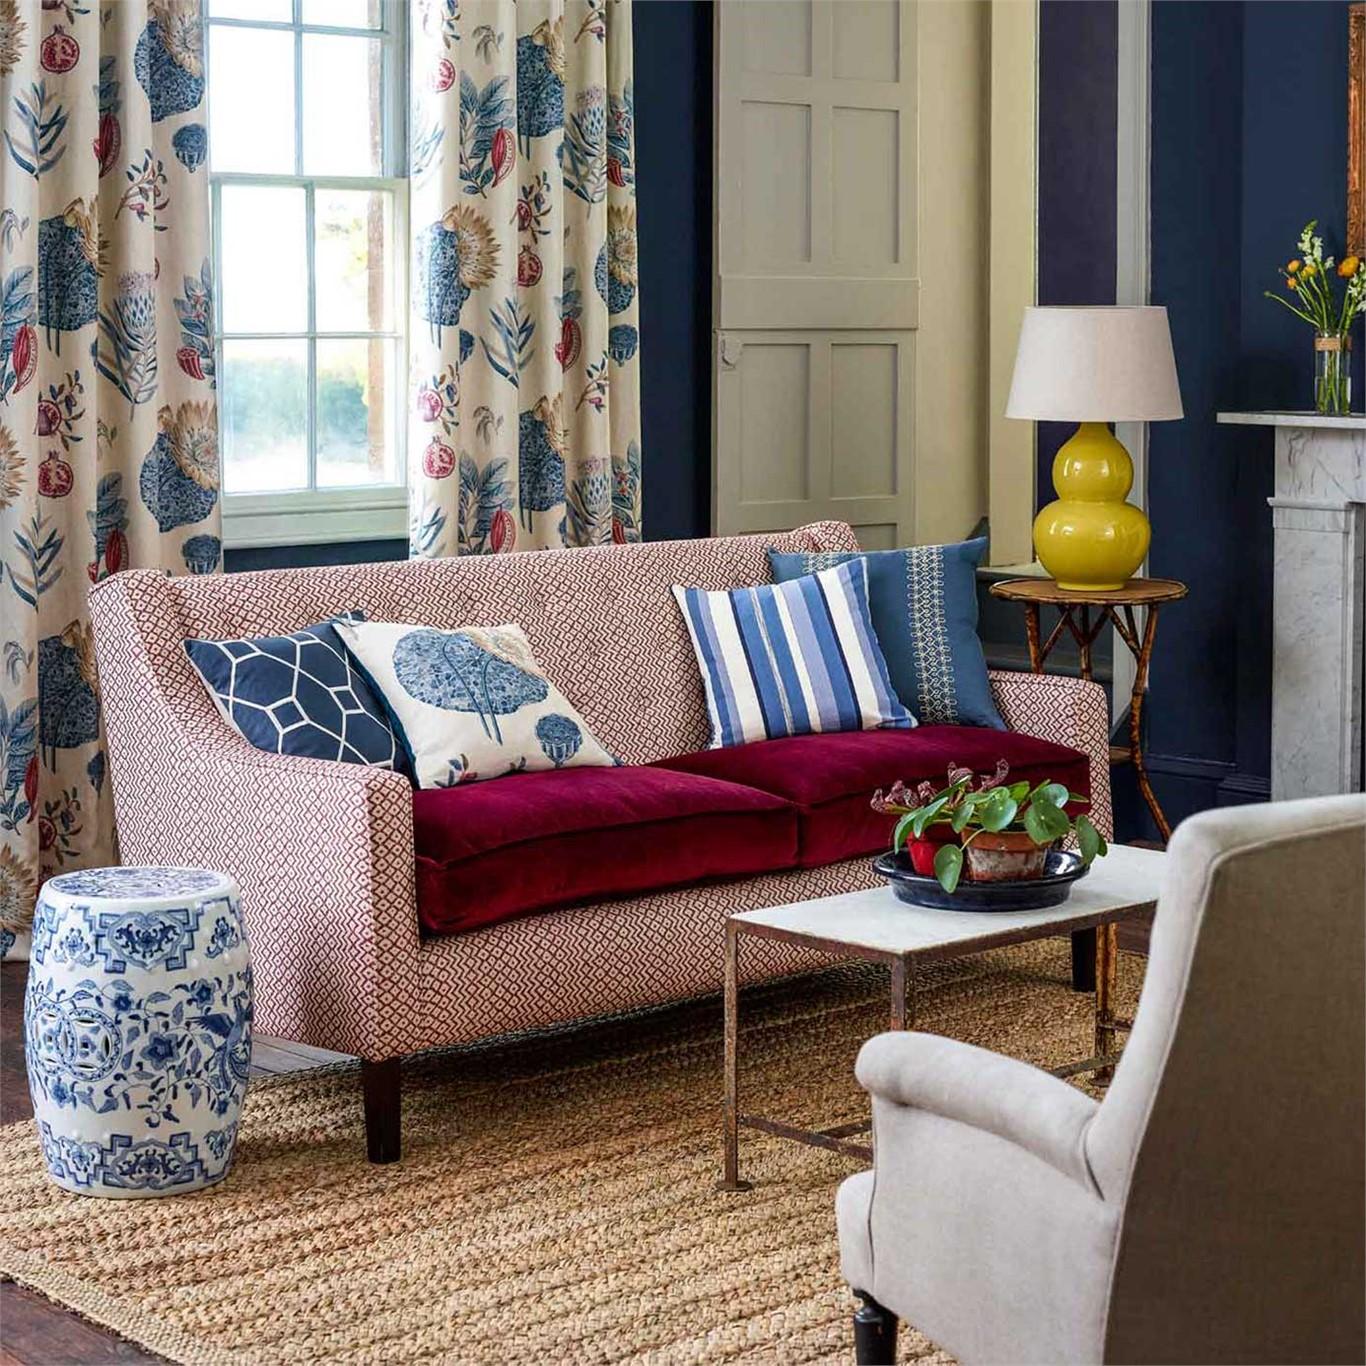 Домашний текстиль в комнате